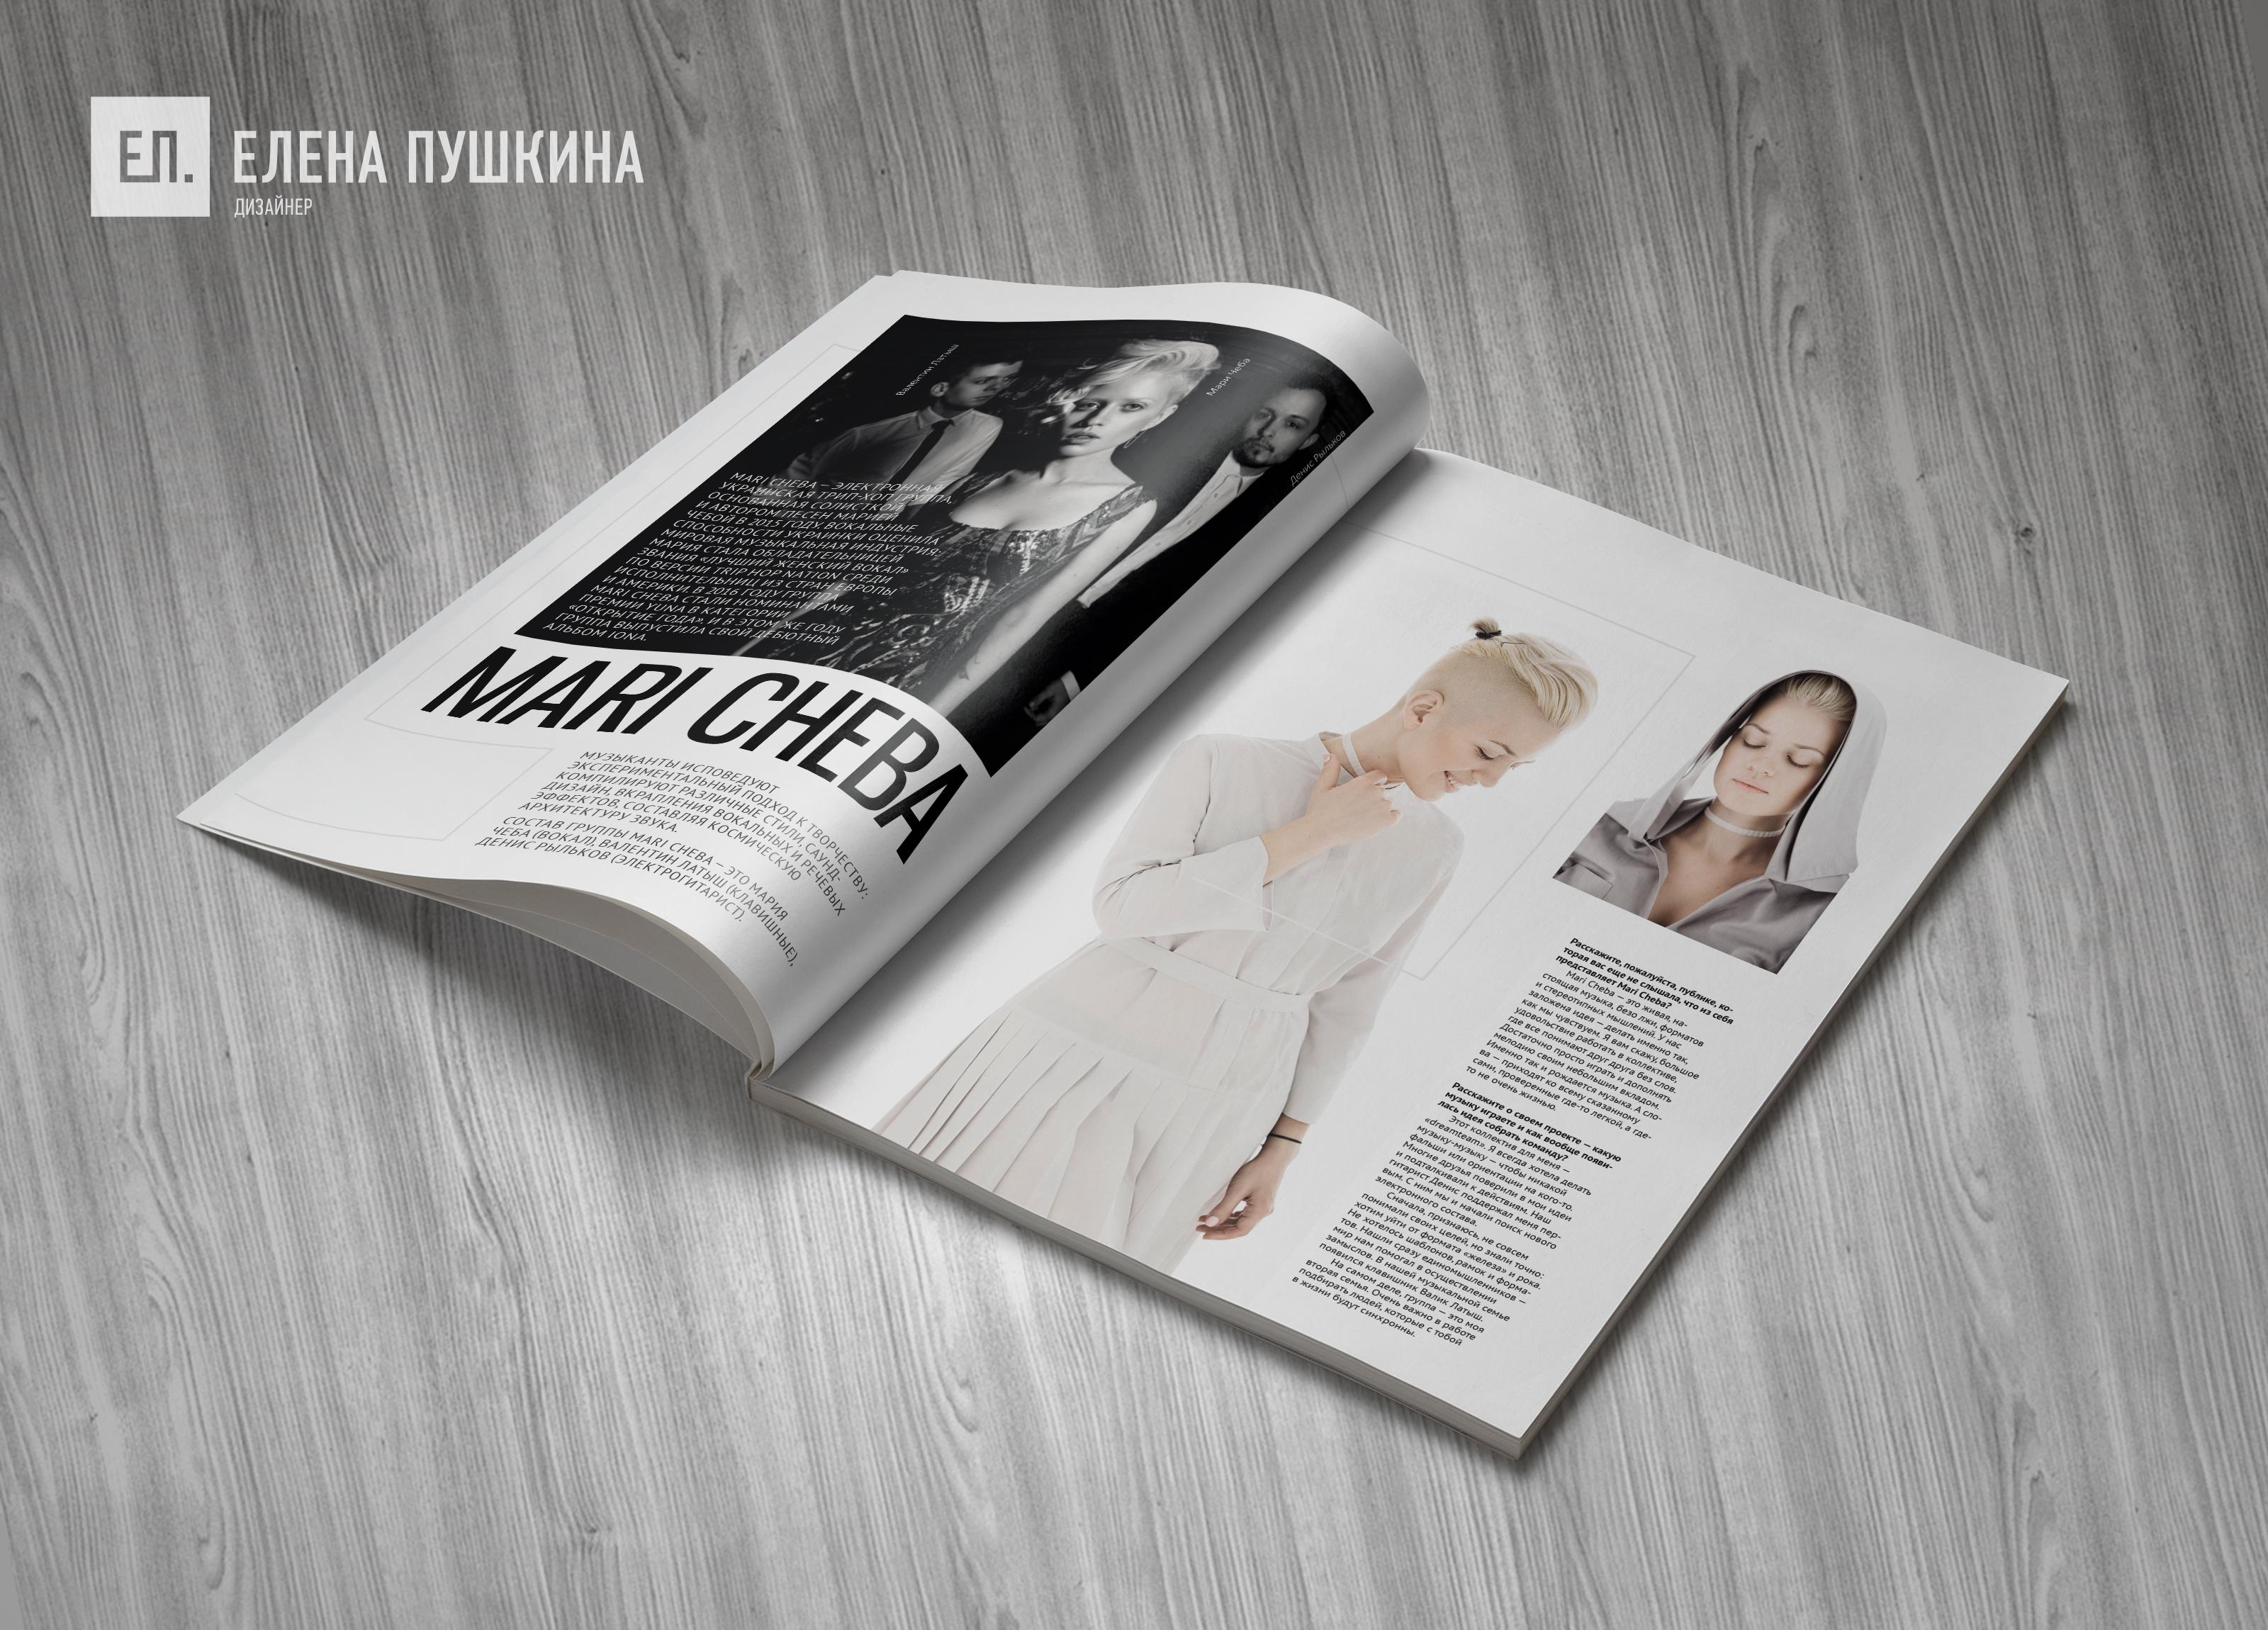 Глянцевый журнал «CoolBaba» №39 лето 2017— разработка дизайна ивёрстка журнала Разработка журналов Портфолио